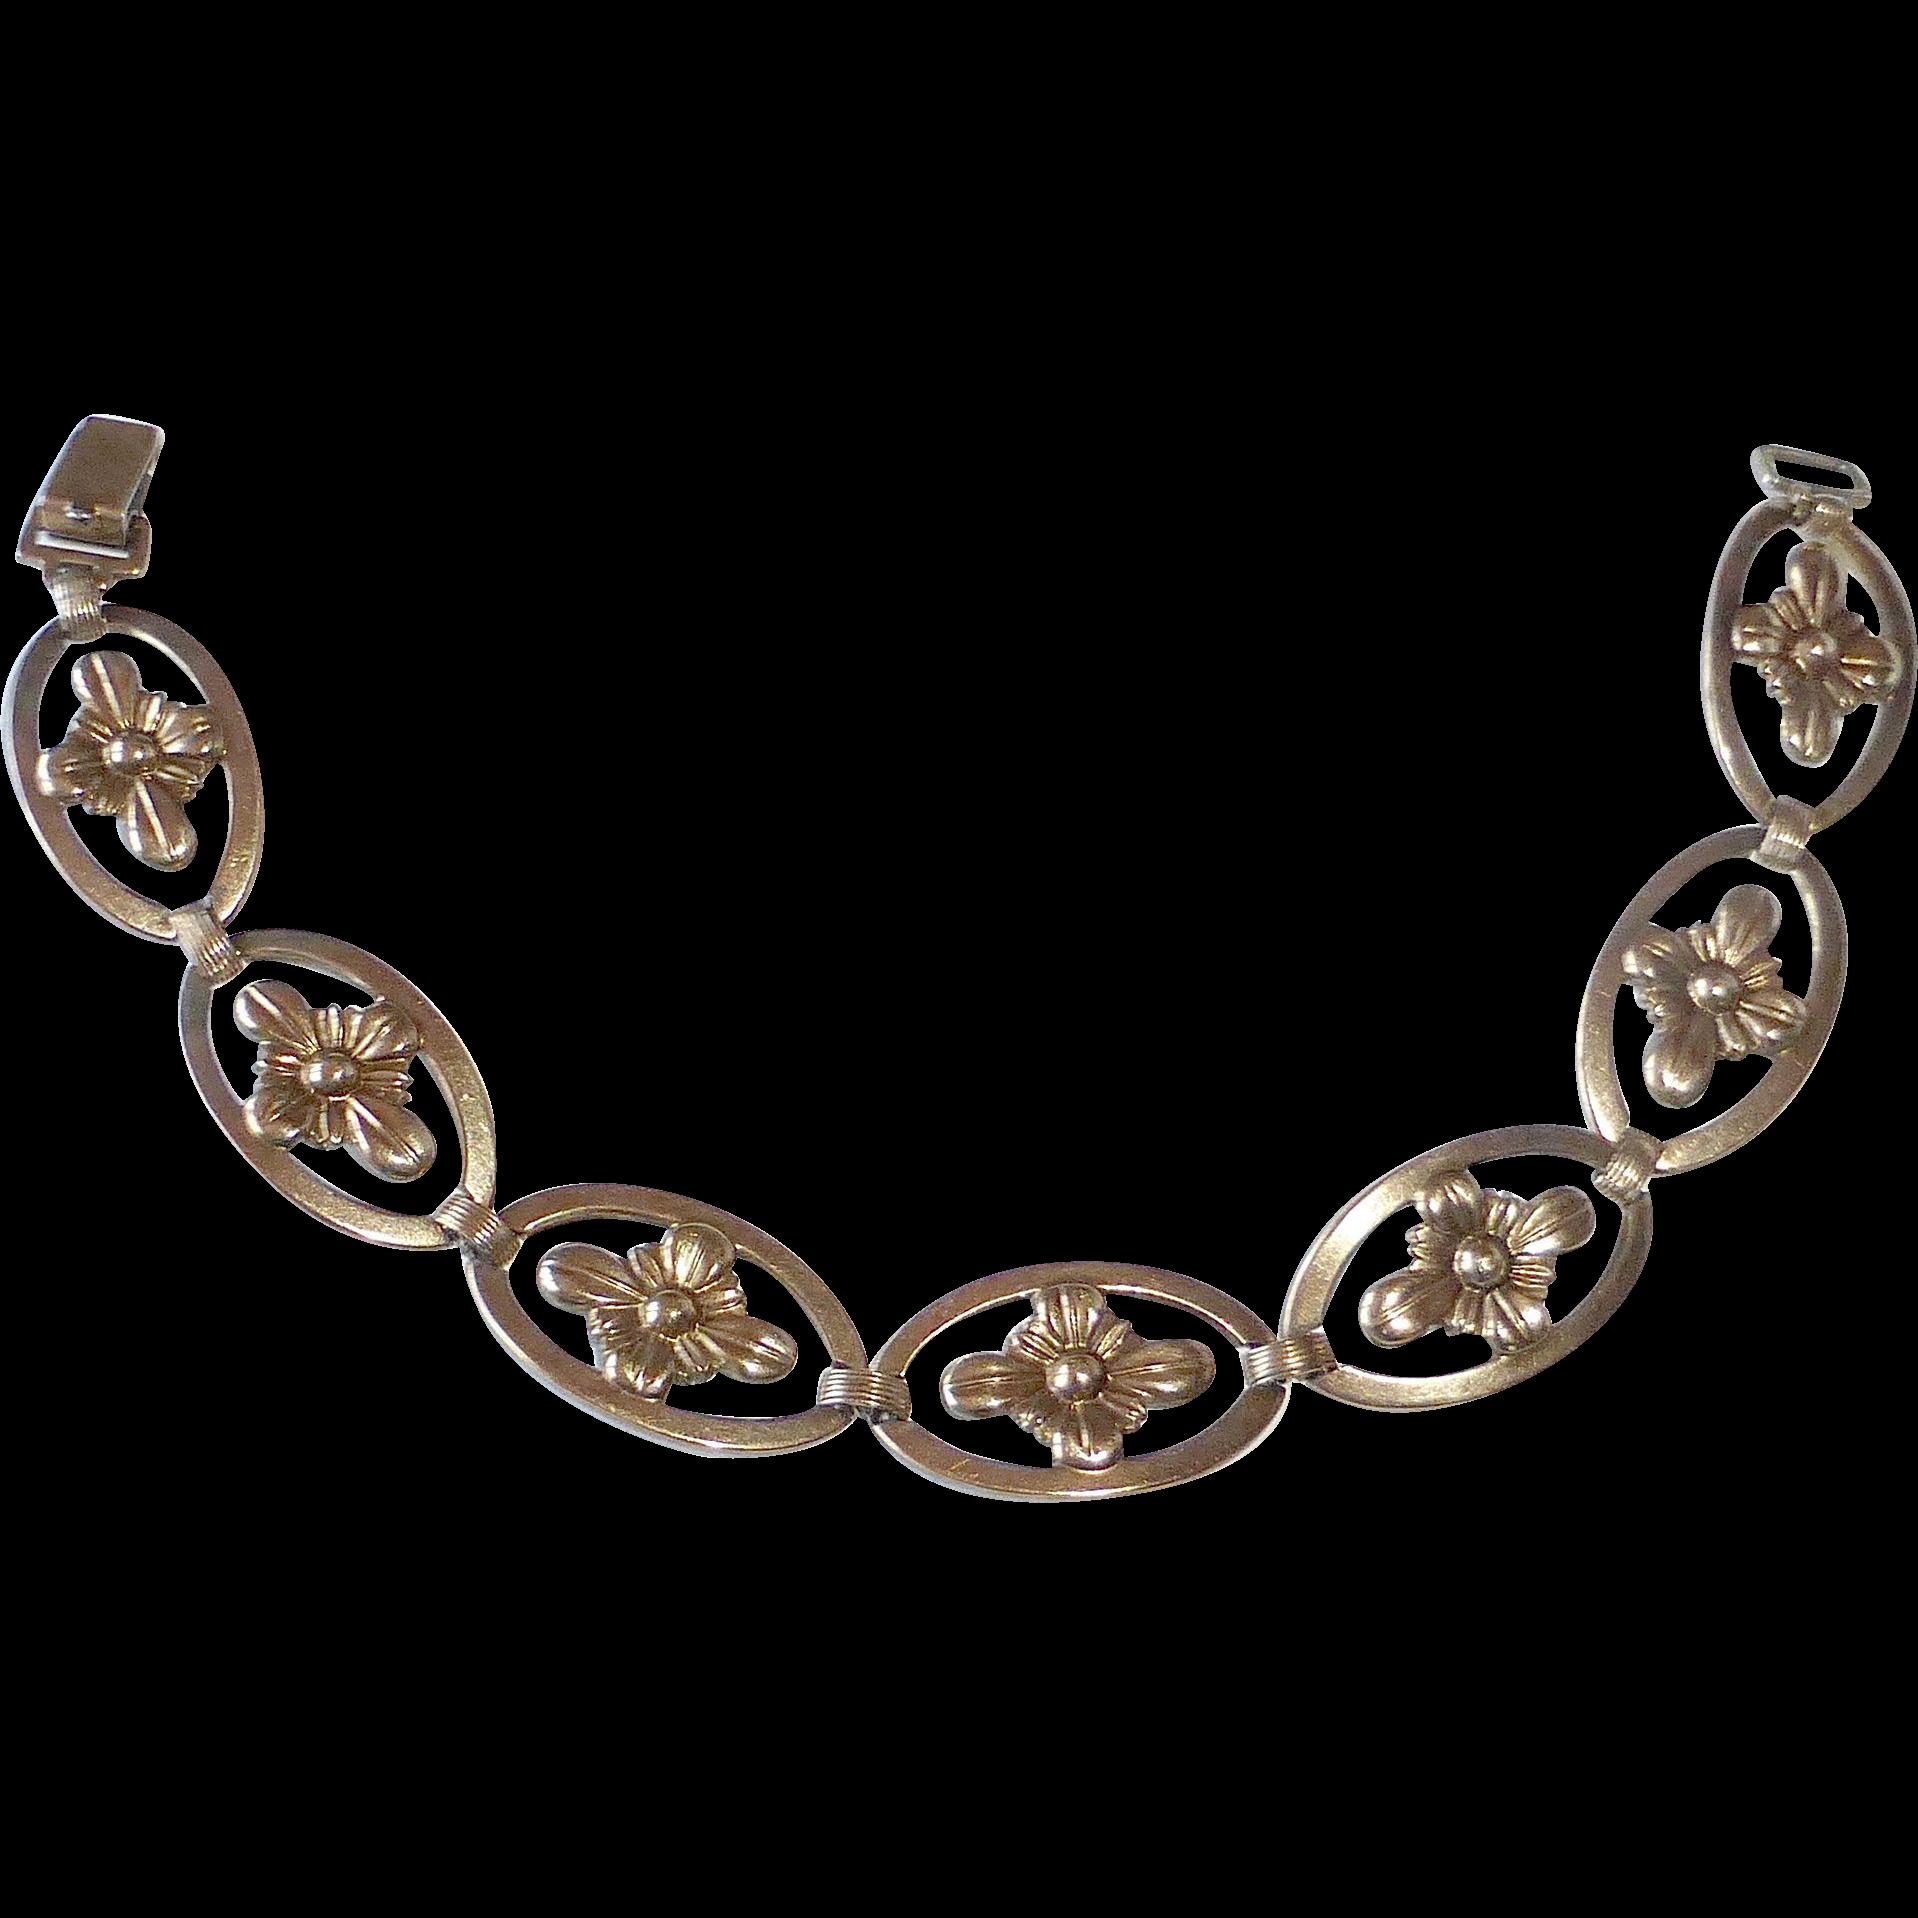 Symmetalic Sterling & 14k Link Bracelet